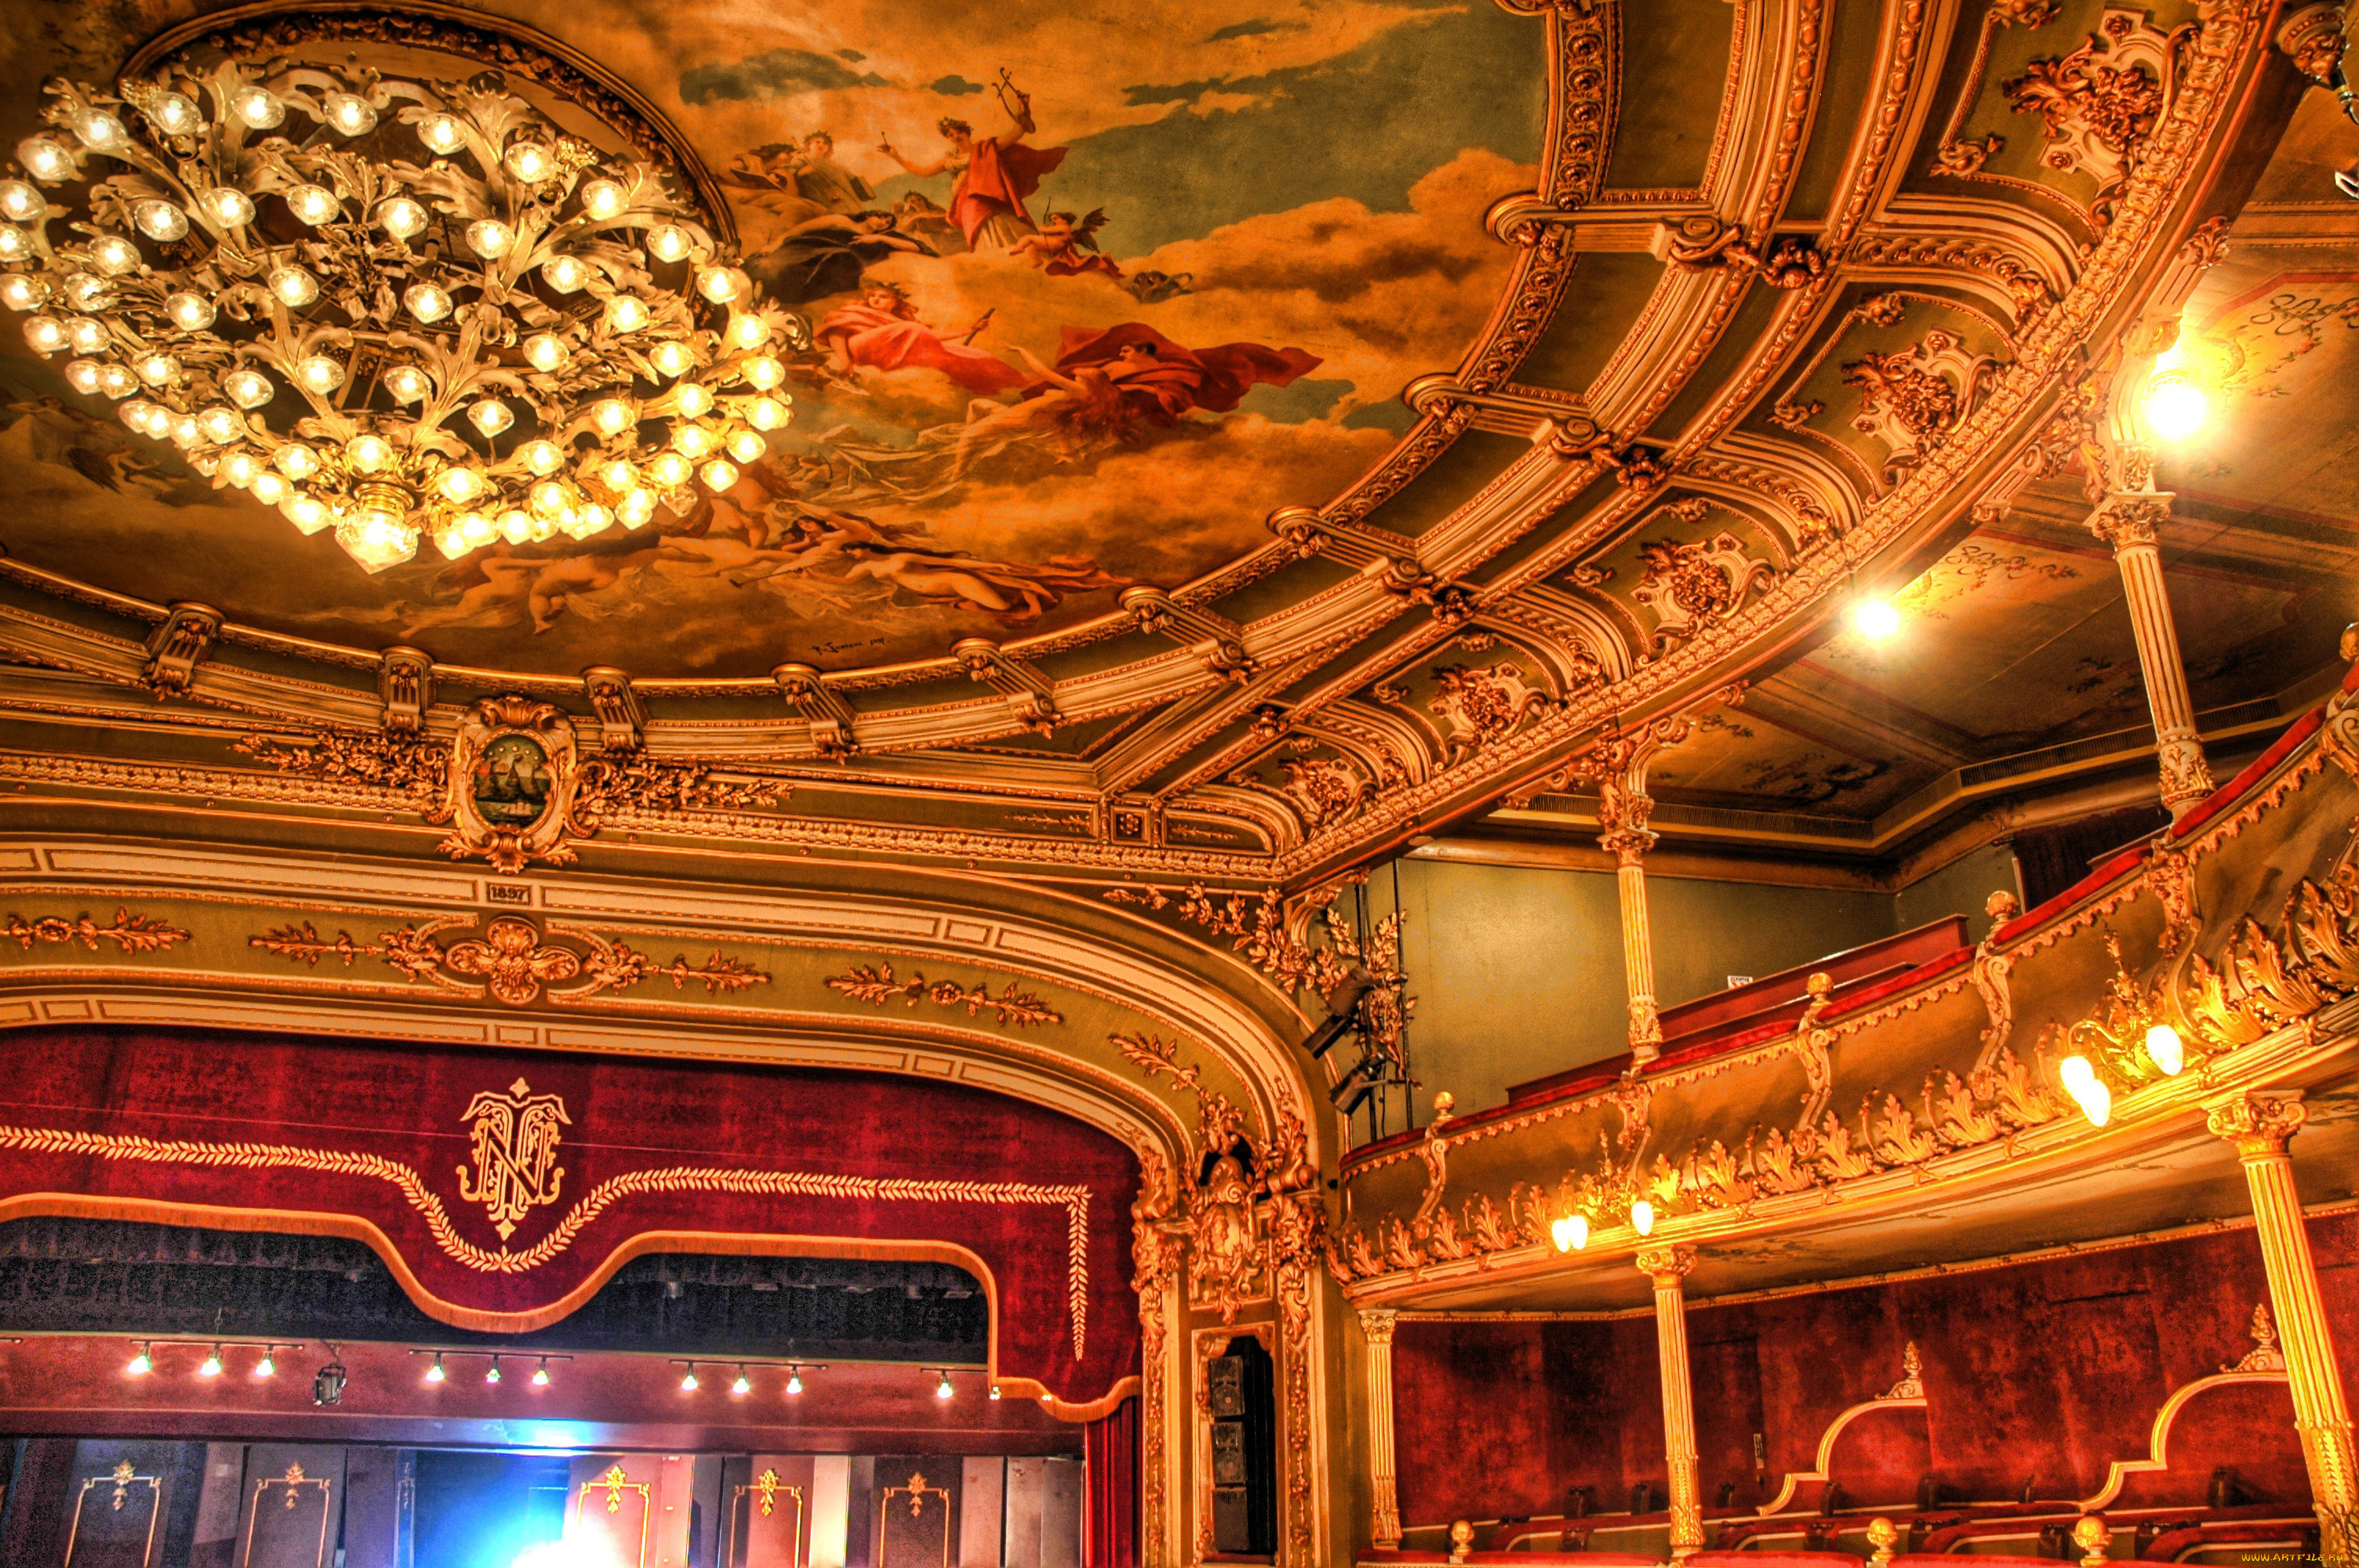 интерьер театра фото город